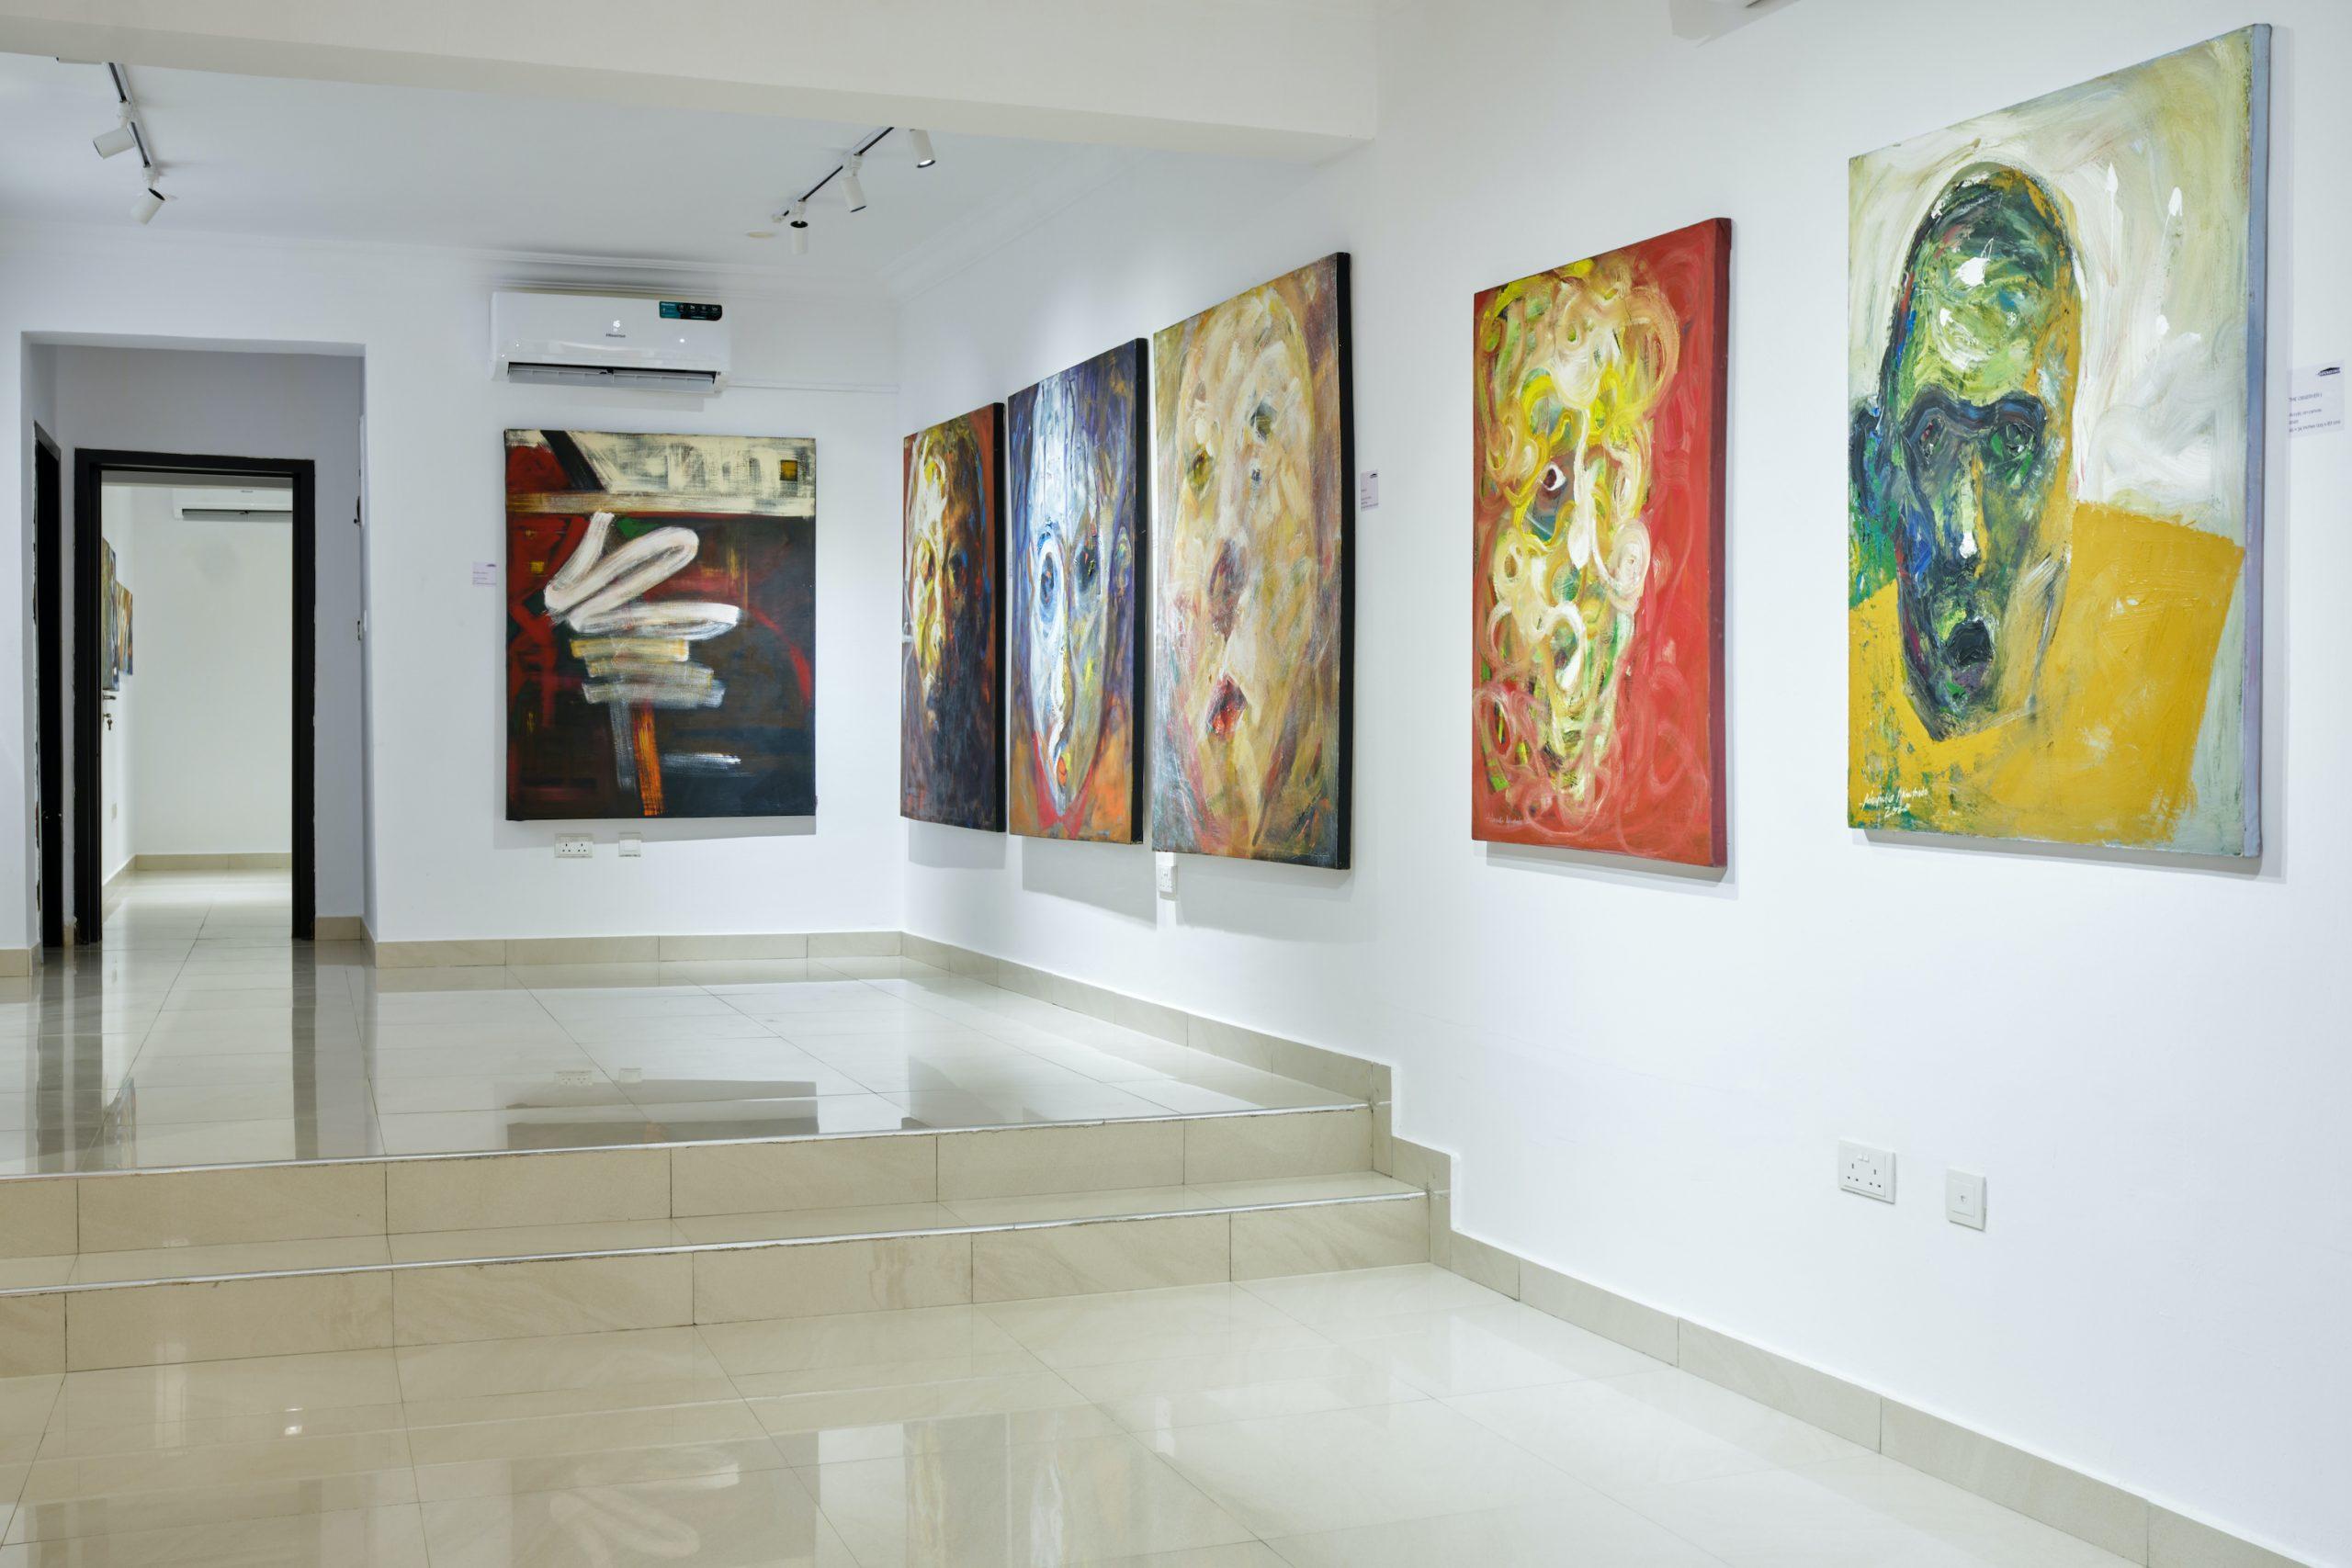 Installation view of State of Mind by Adeyinka Akingbade at Art Pantheon in Lagos. Photo credit: Alli Akinwande / Courtesy of Art Pantheon